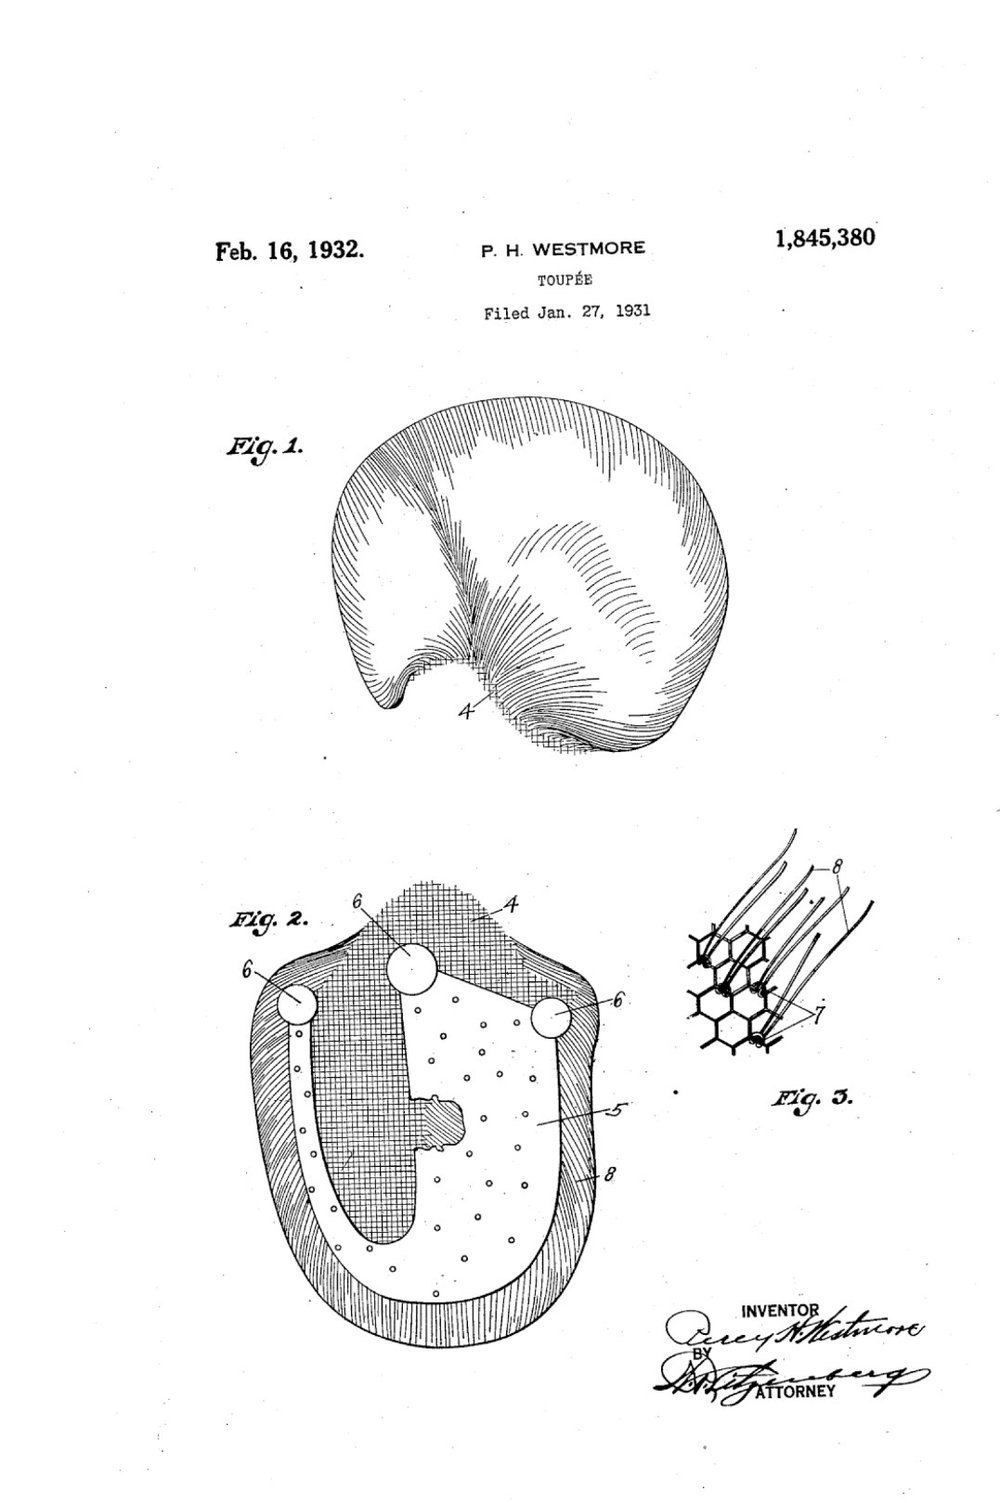 Perc Westmore's toupee patent, USPTO, 1931.